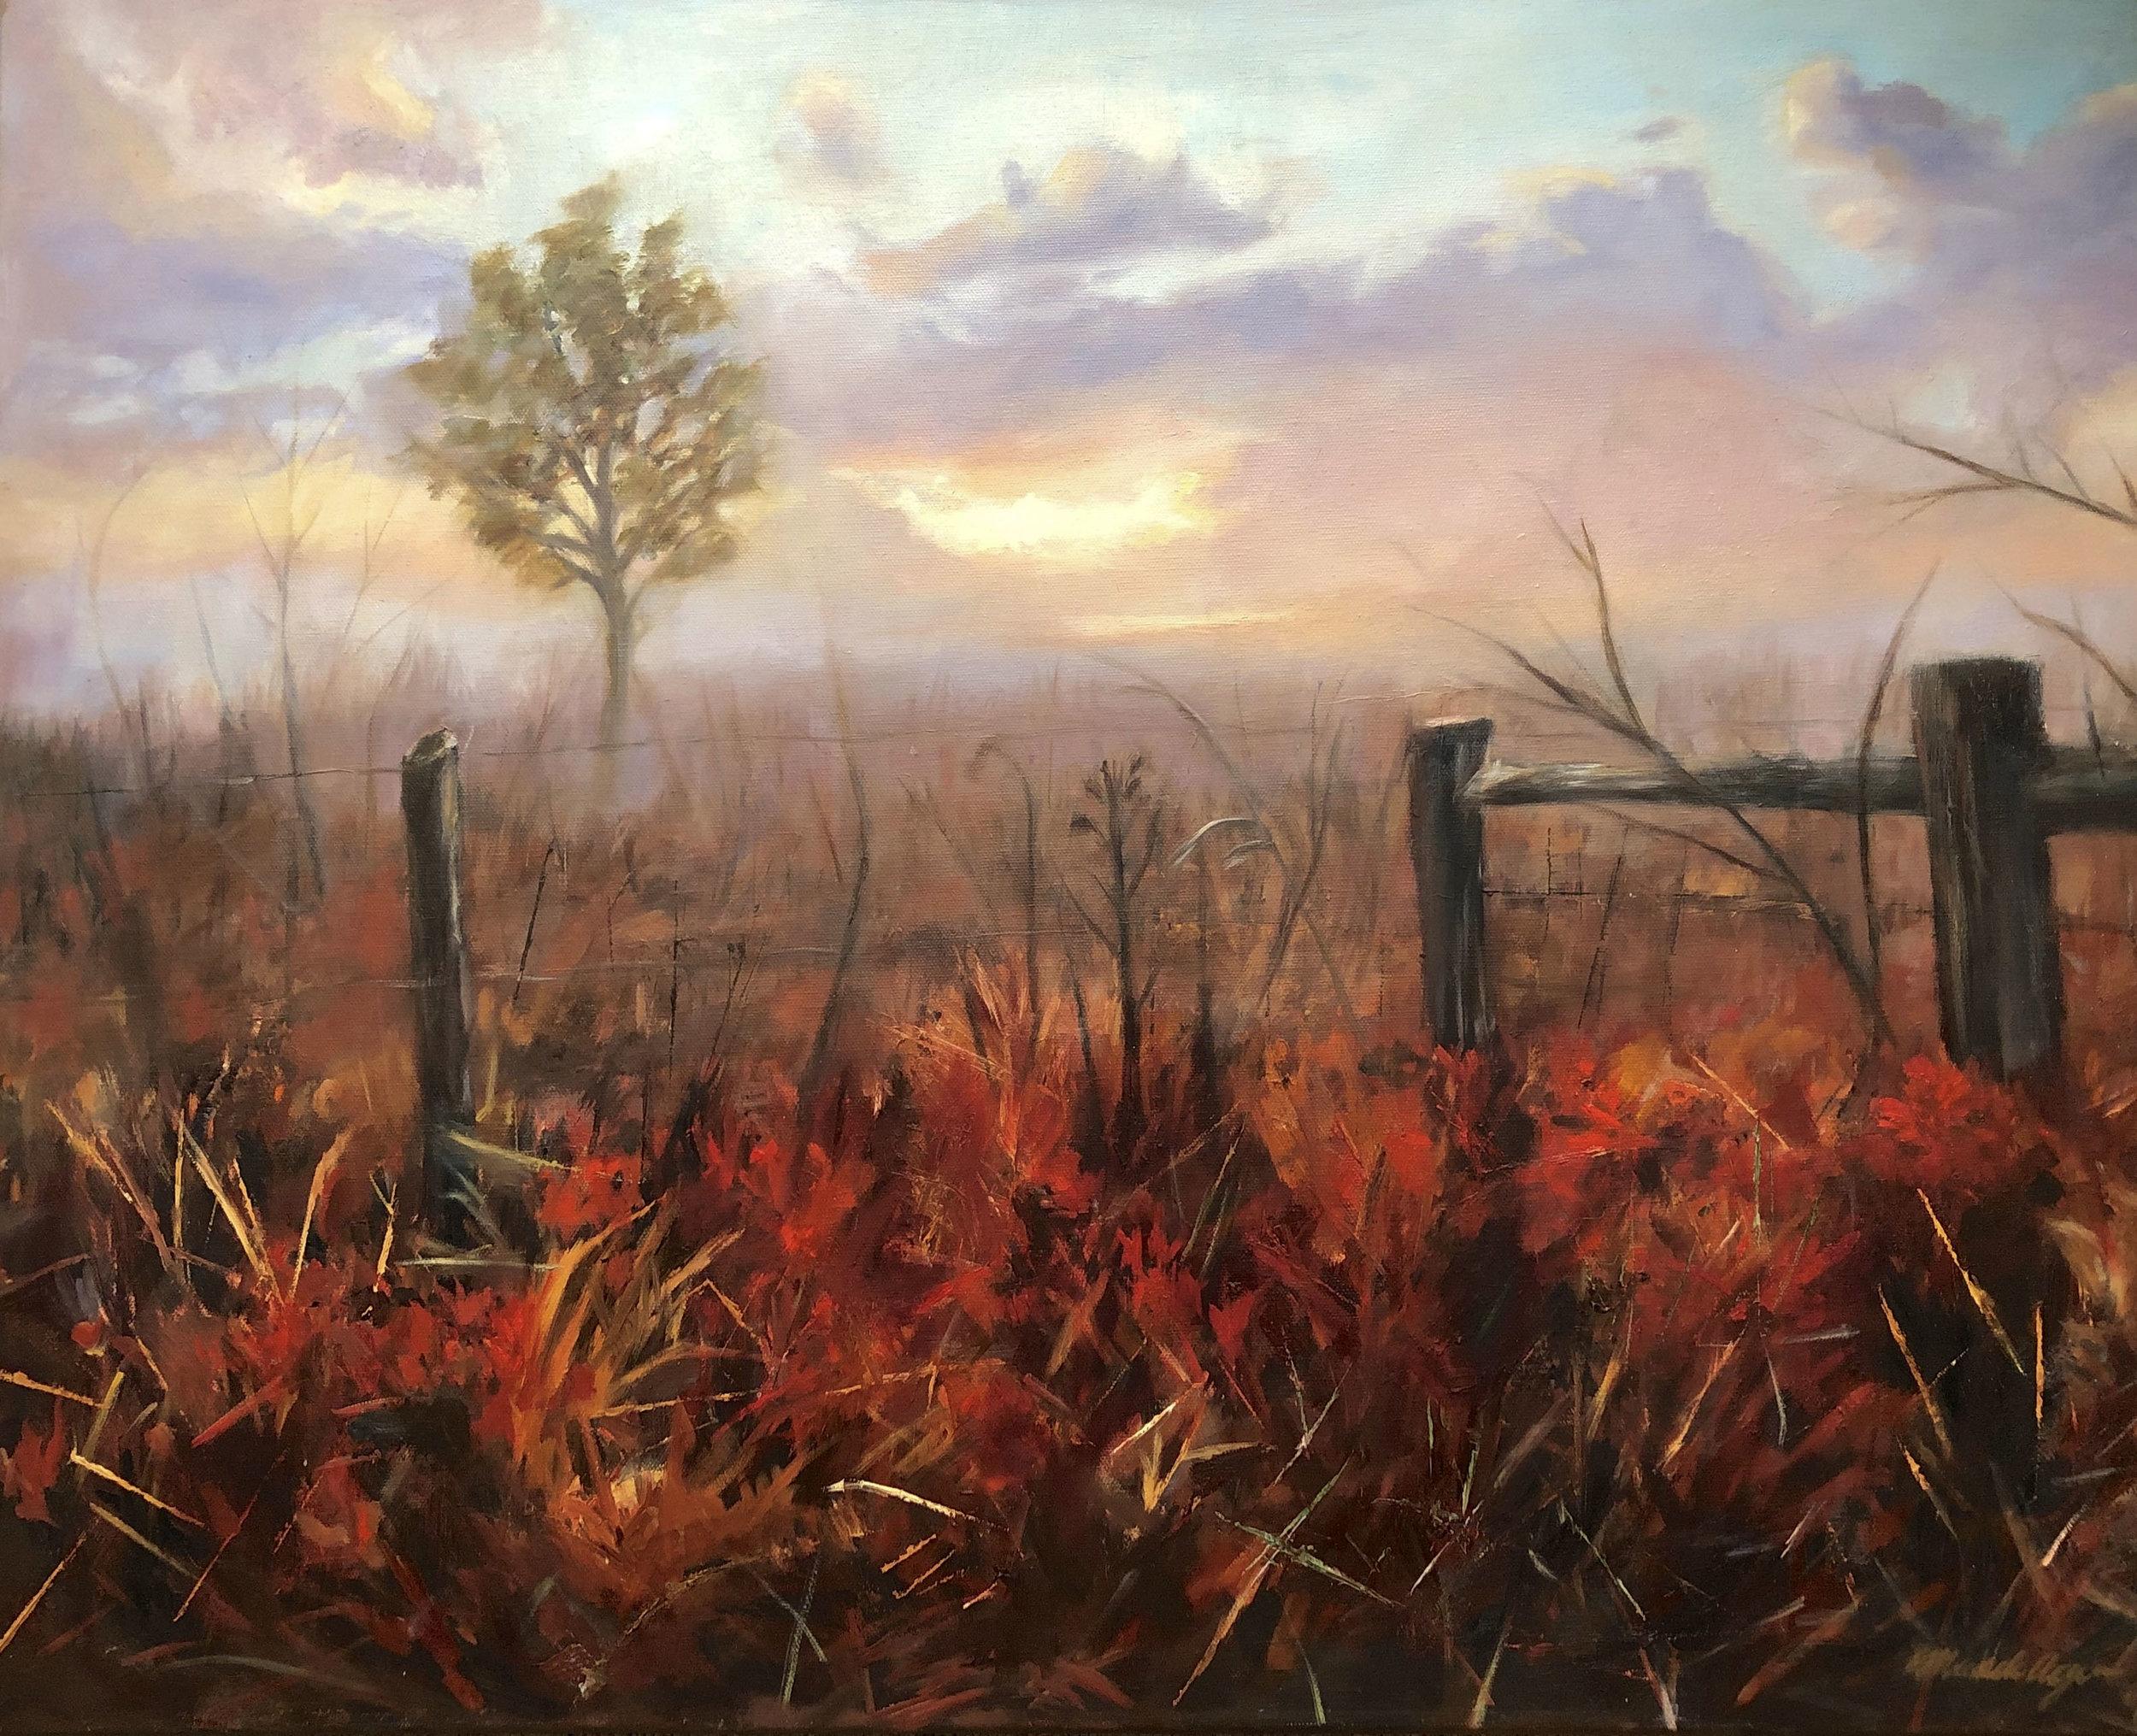 MicaelaAguirre-_Red Sunrise_-Oil-24x30-2018-$1400.jpg